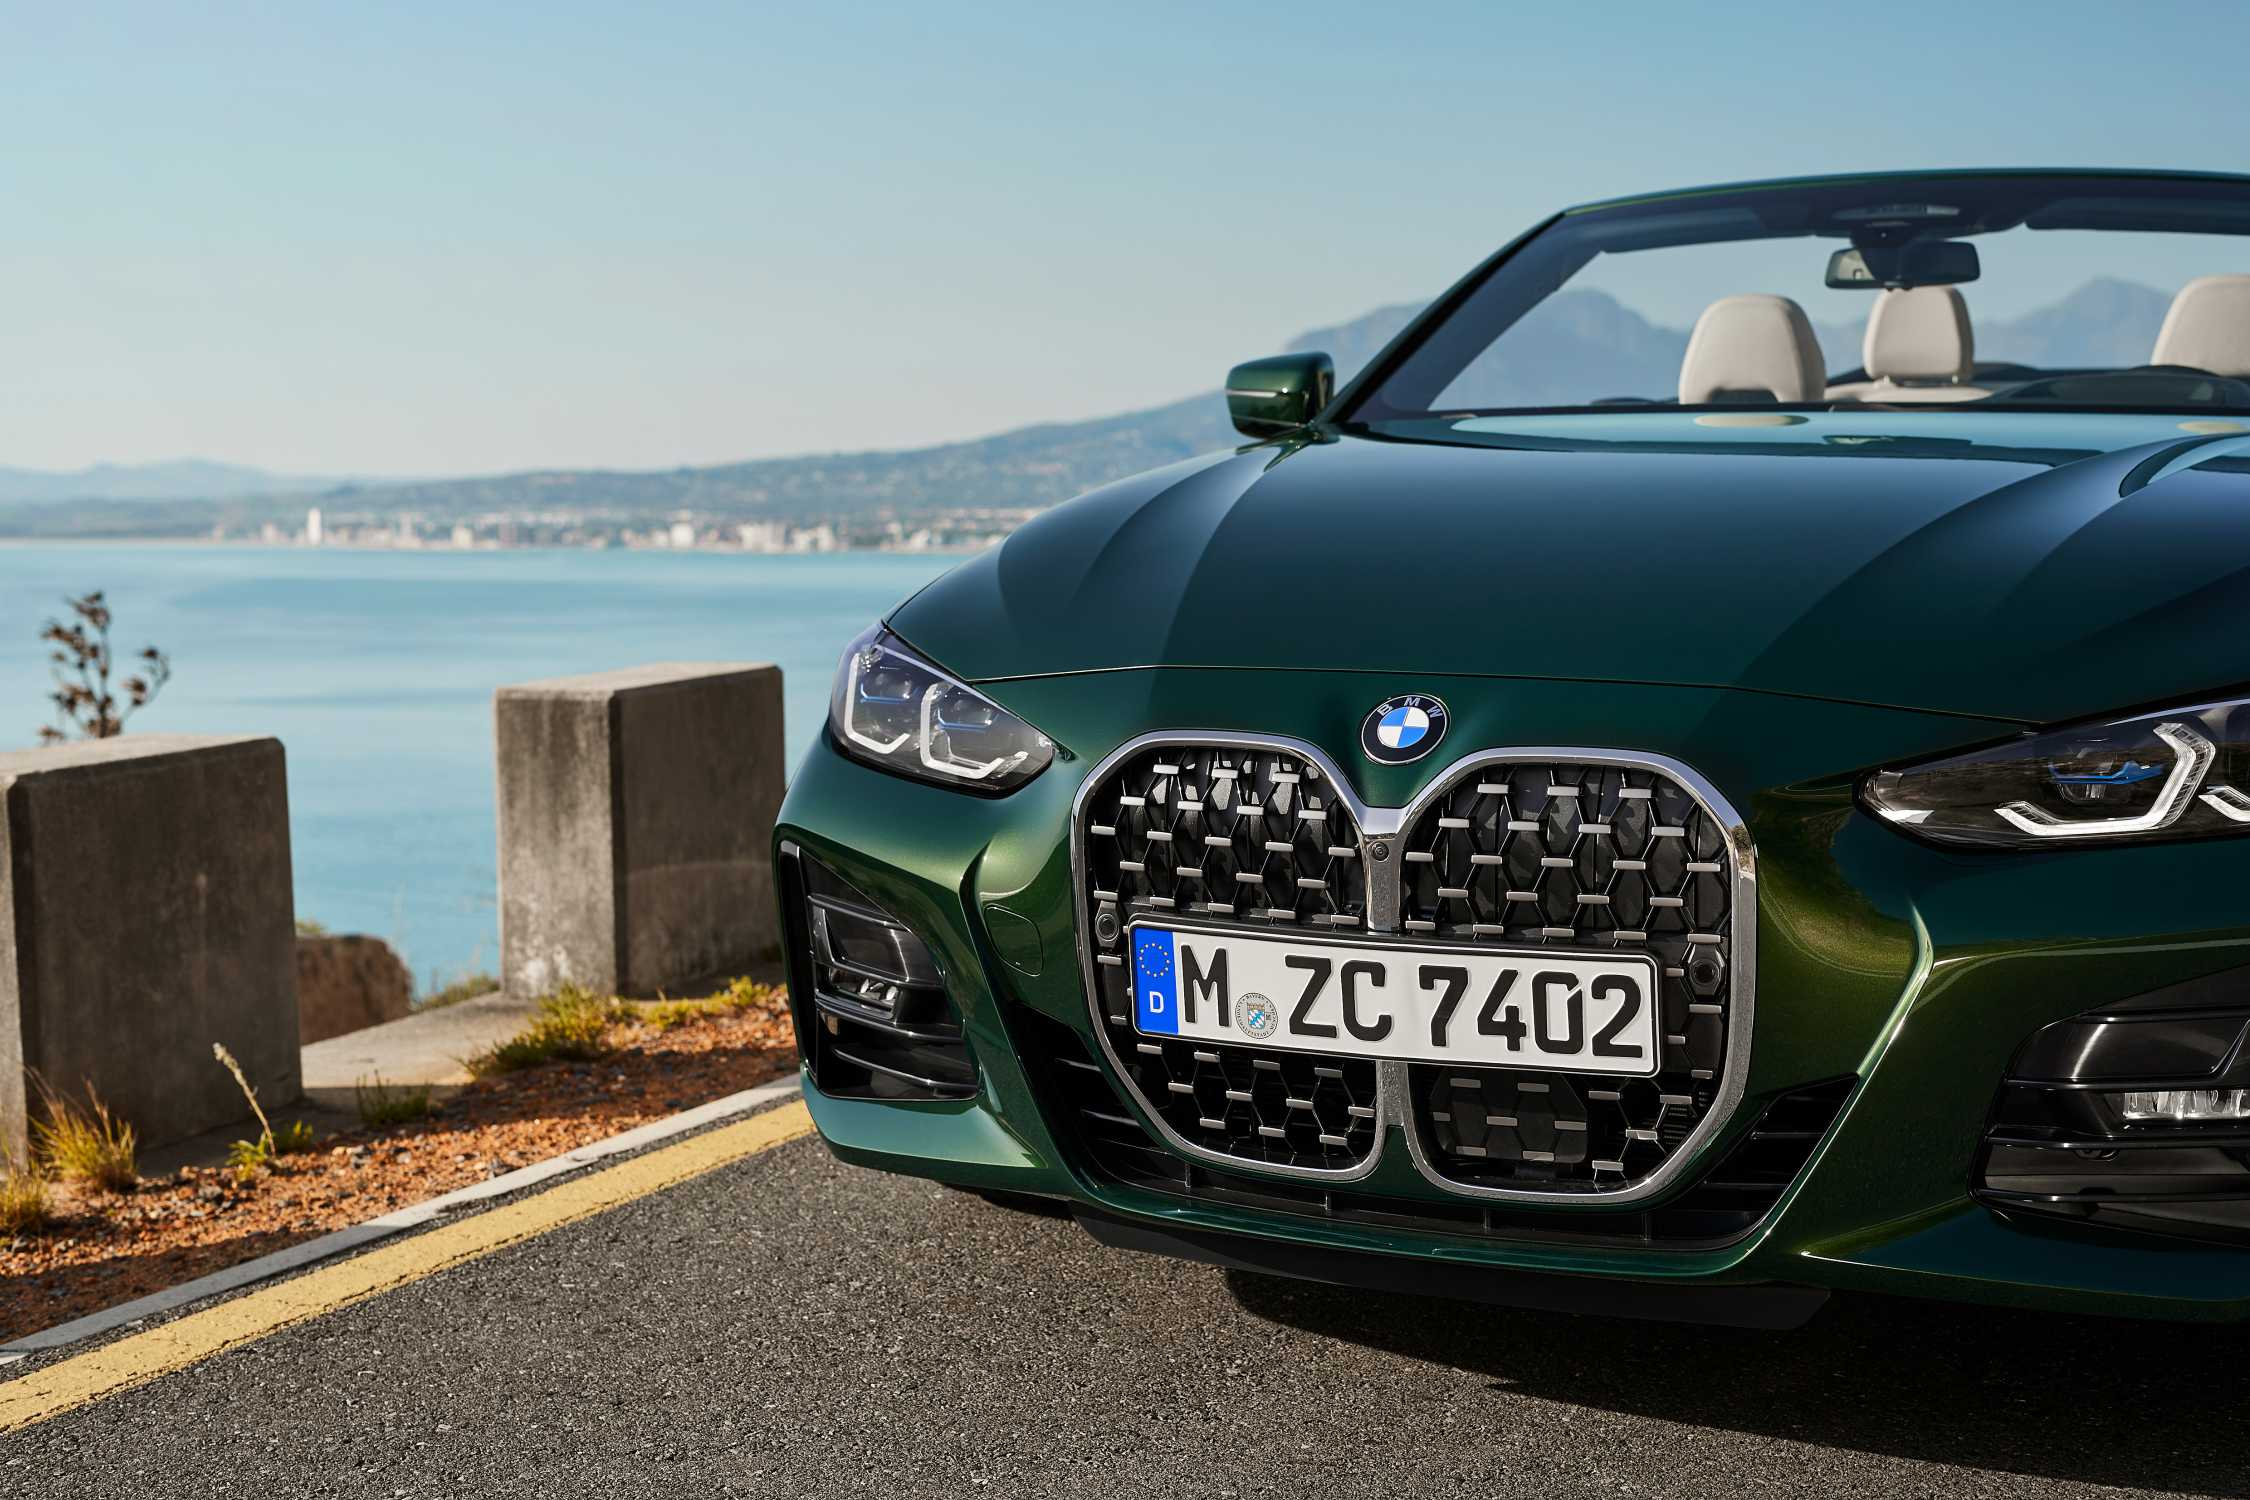 Importer une voiture en allemagne avec motorimport7 - Blog